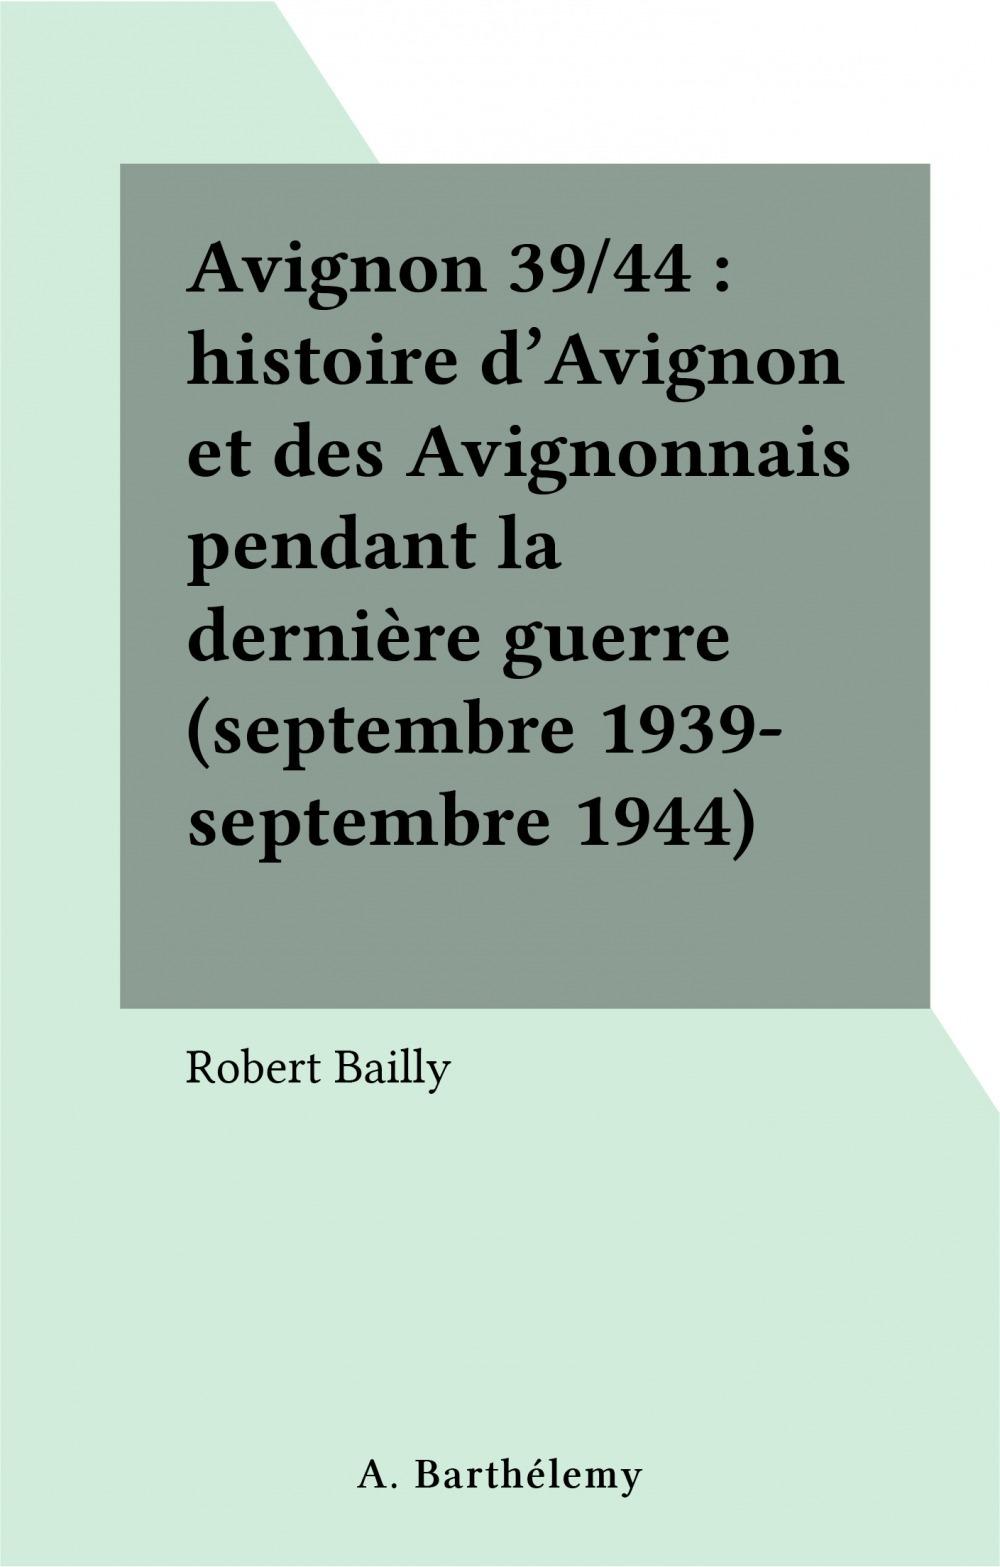 Avignon 39/44